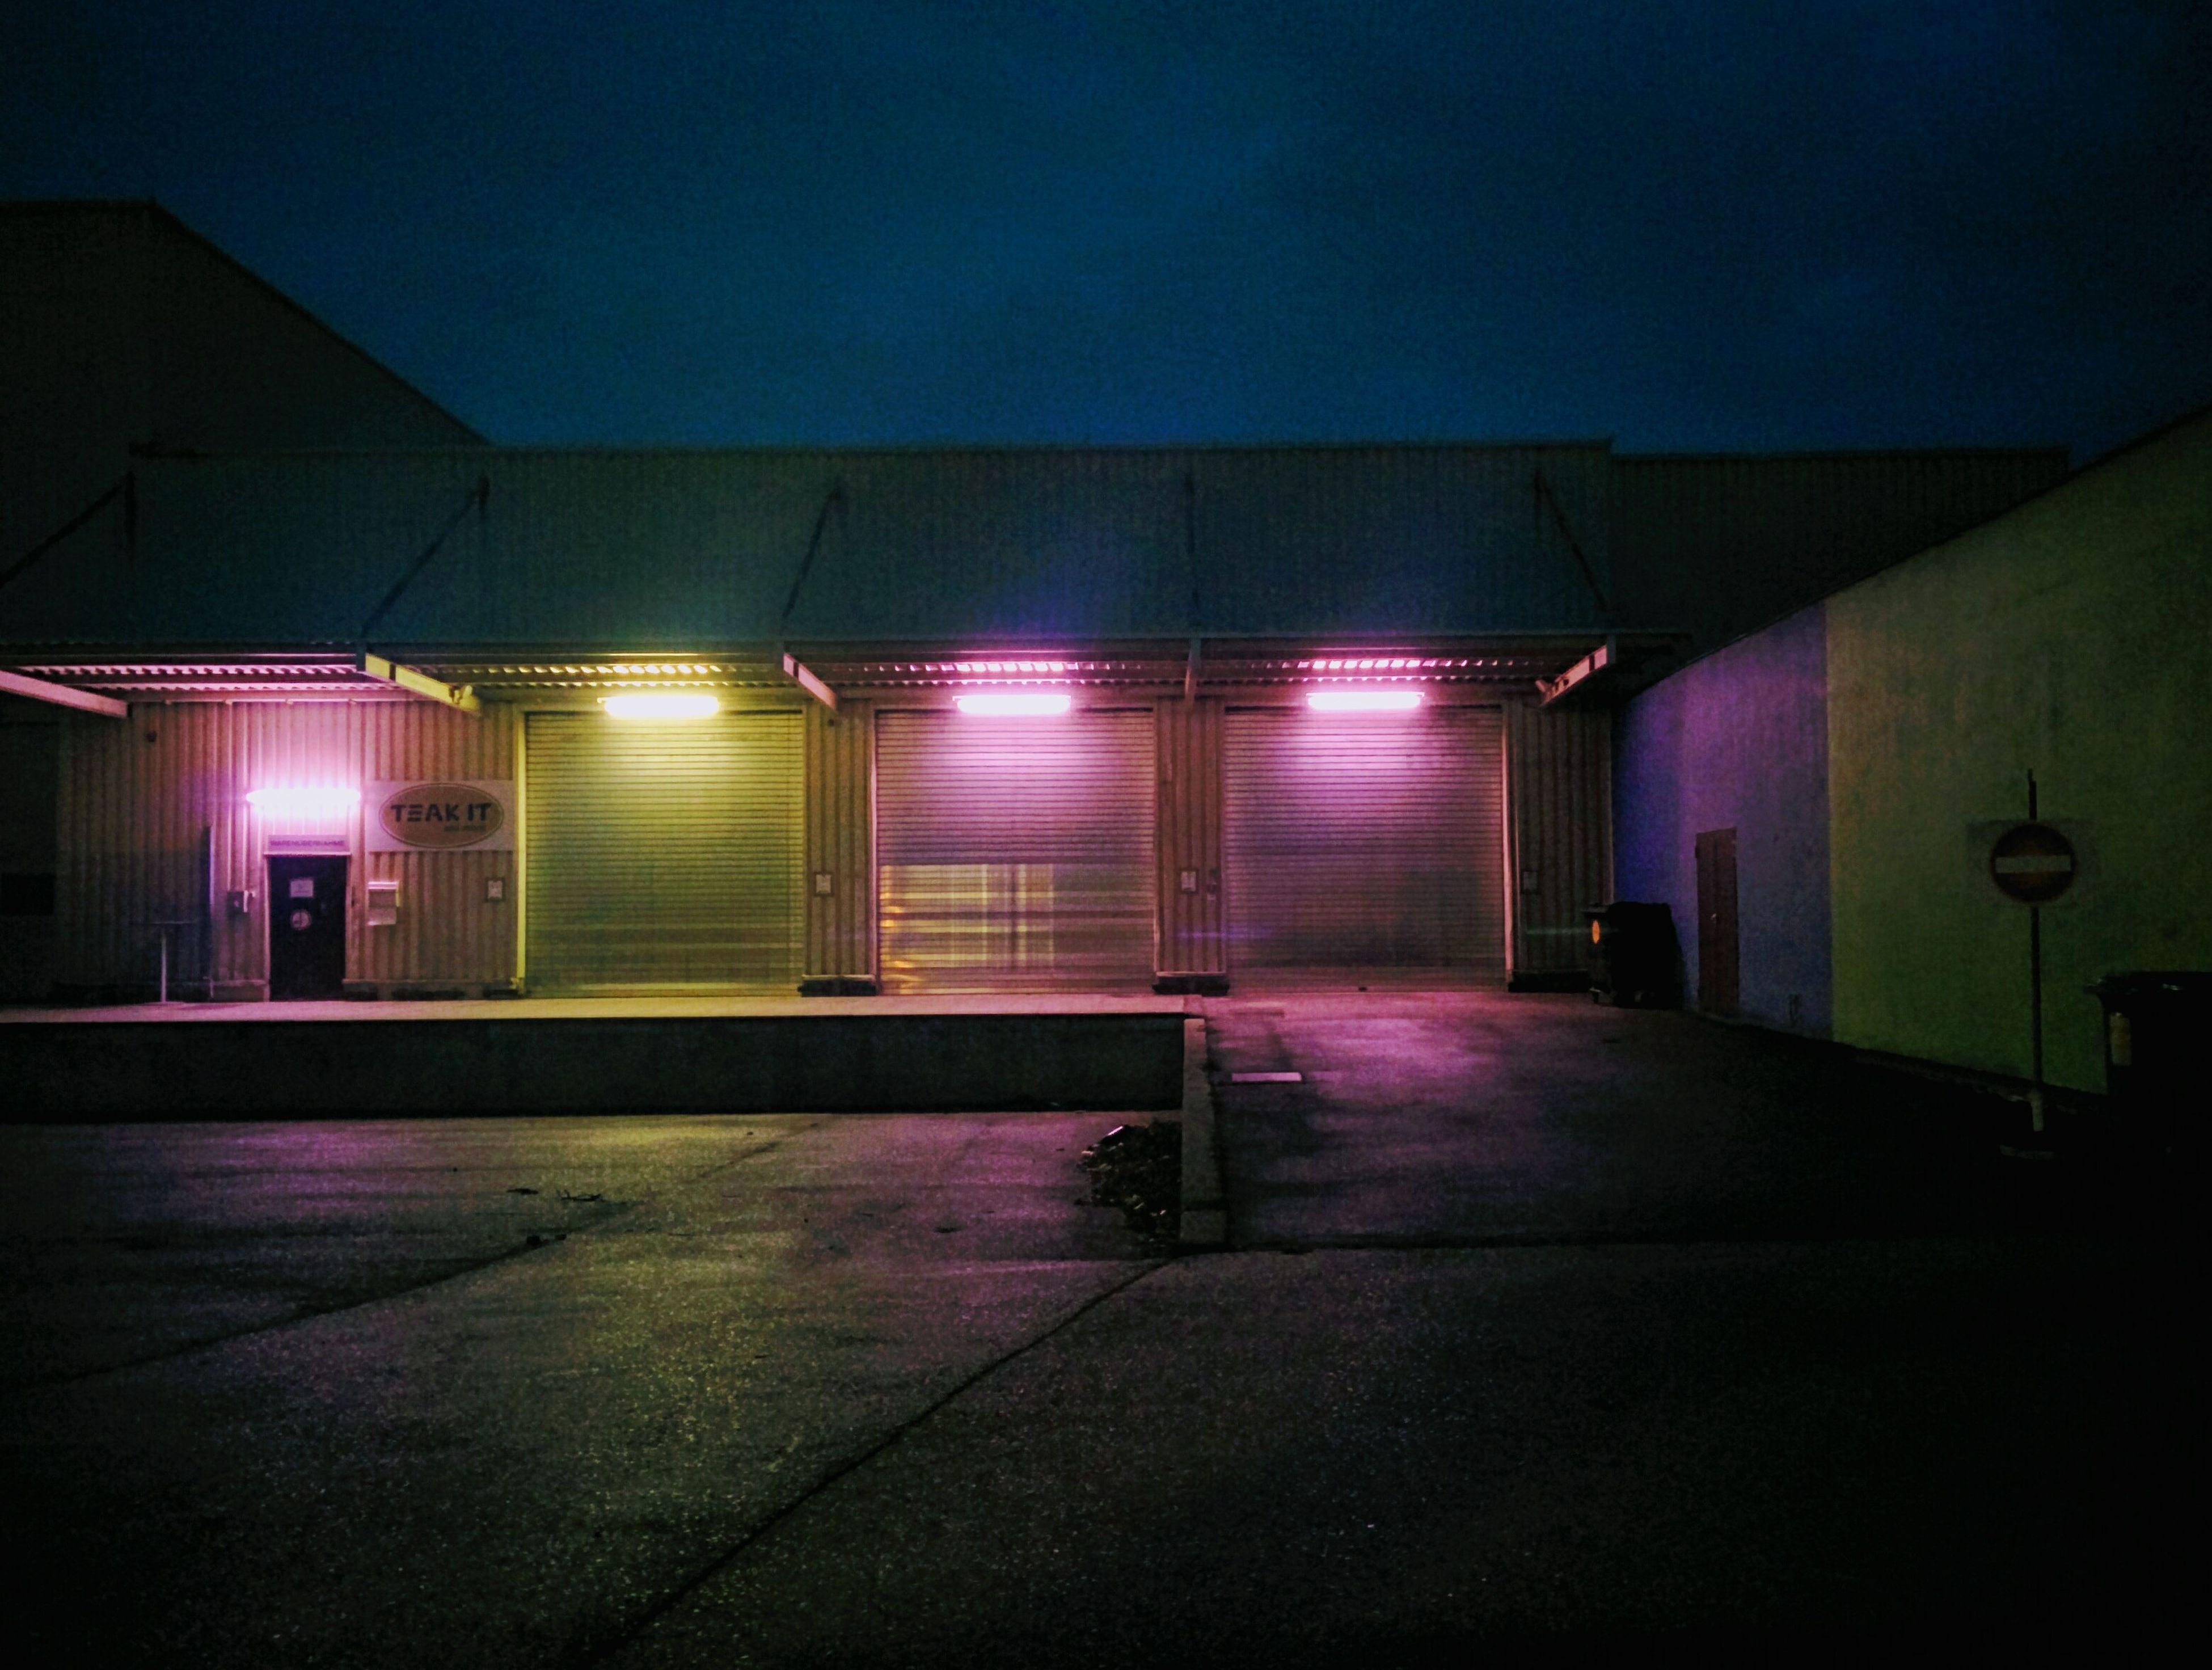 illuminated, night, built structure, architecture, transportation, indoors, no people